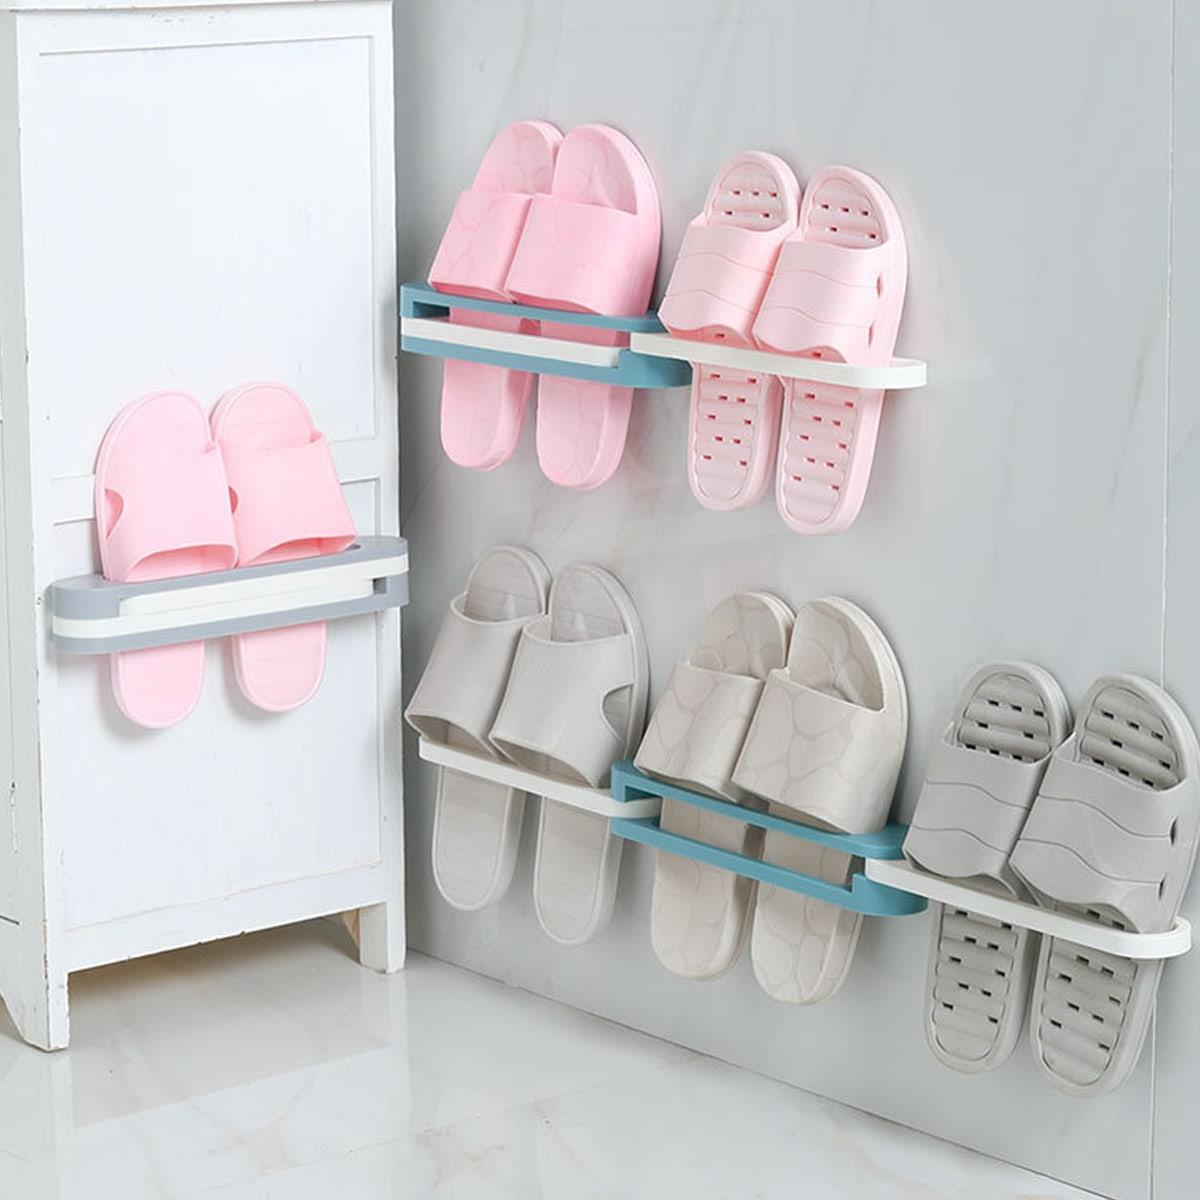 1pc 3 in 1 badkamer slippers rek